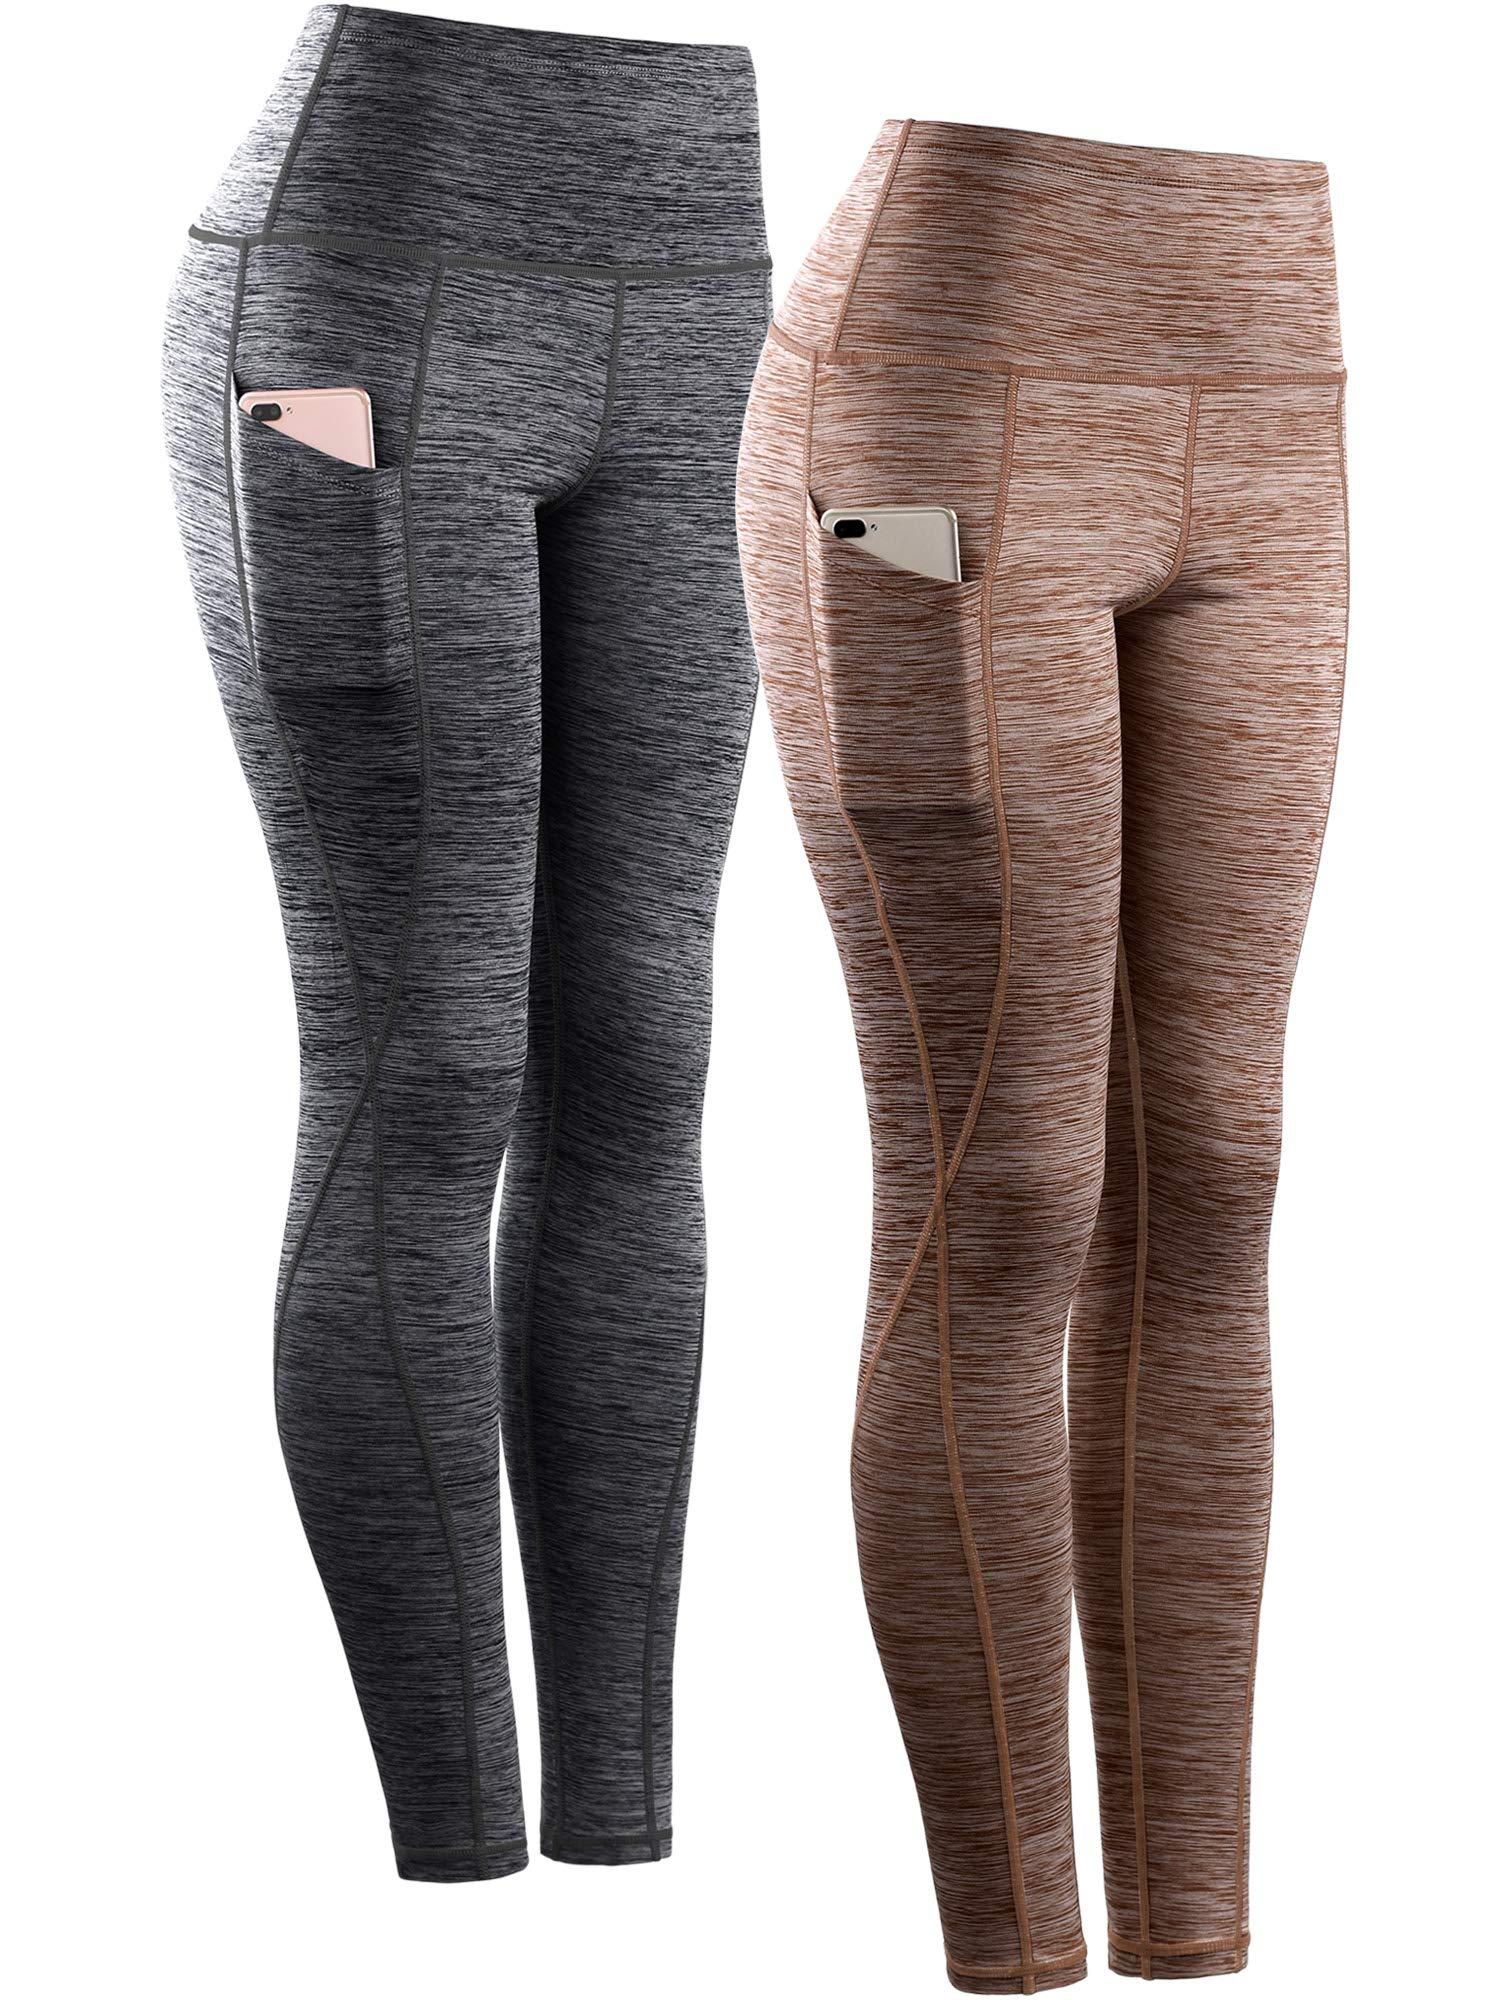 Neleus Women's Yoga Pant Running Workout Leggings with Pocket Tummy Control High Waist,9033,2 Pack,Black,Brown,M,EU L by Neleus